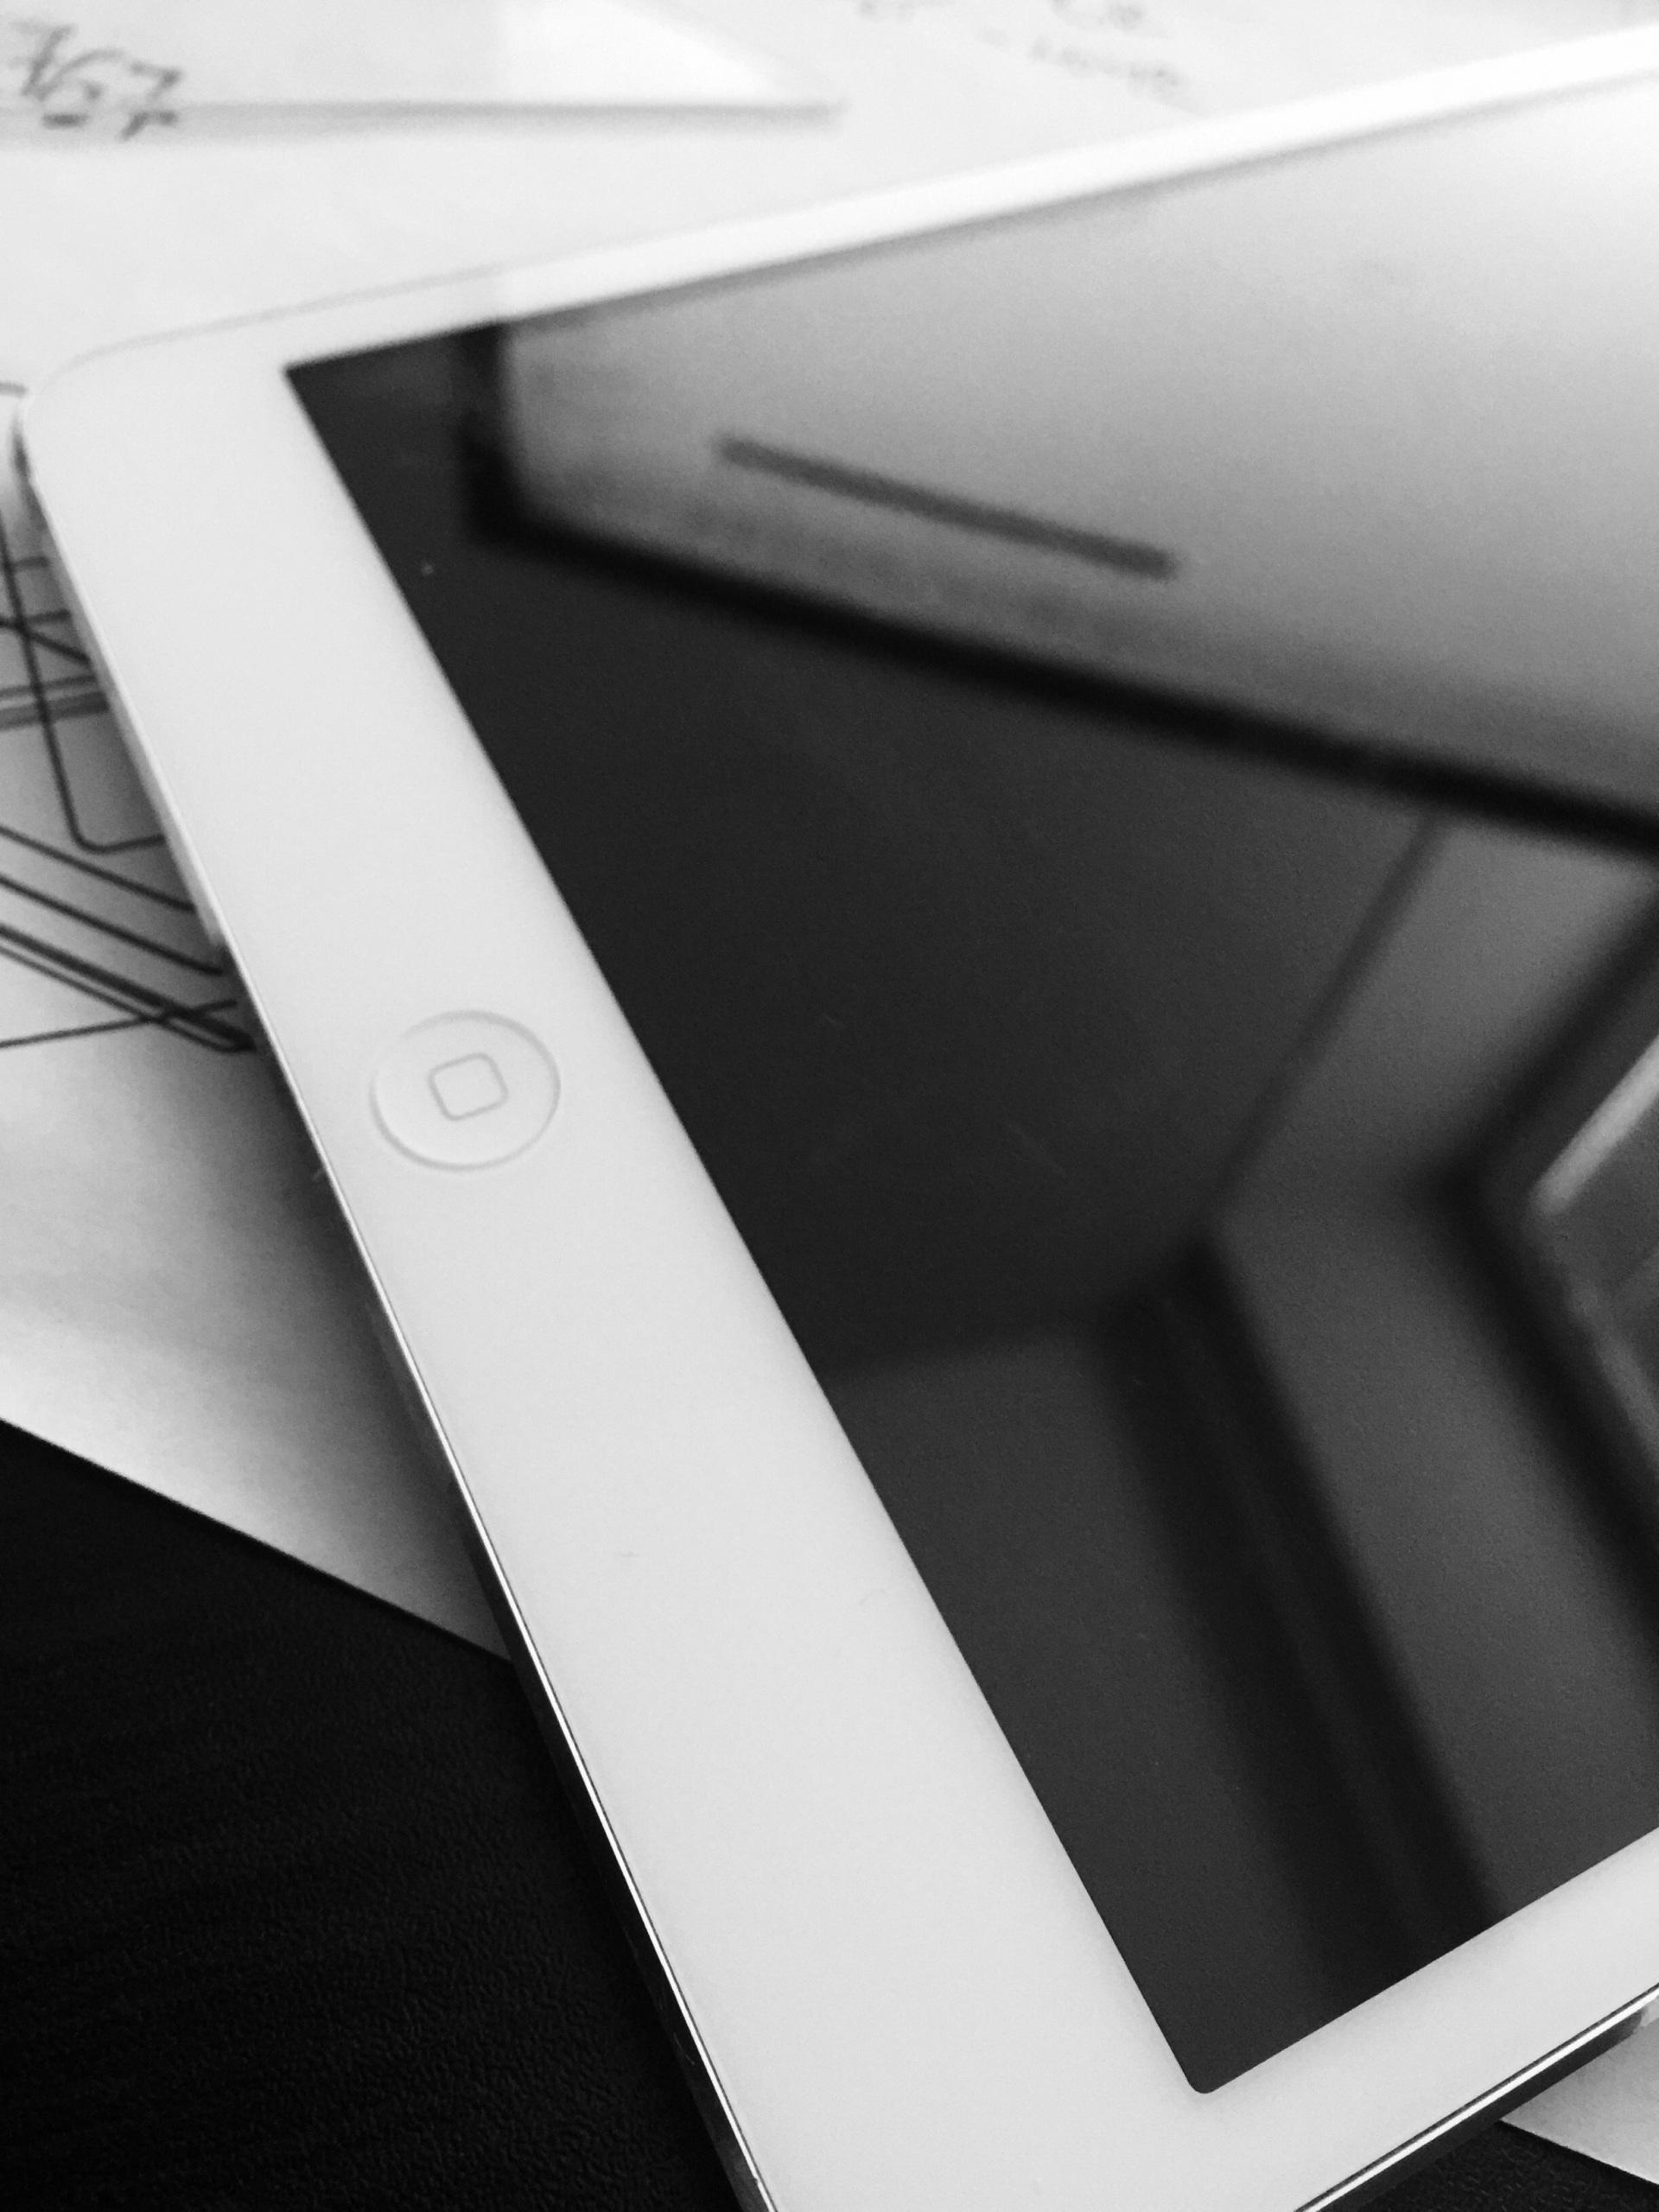 iPad Pedro Topete Apple Blog Portugal